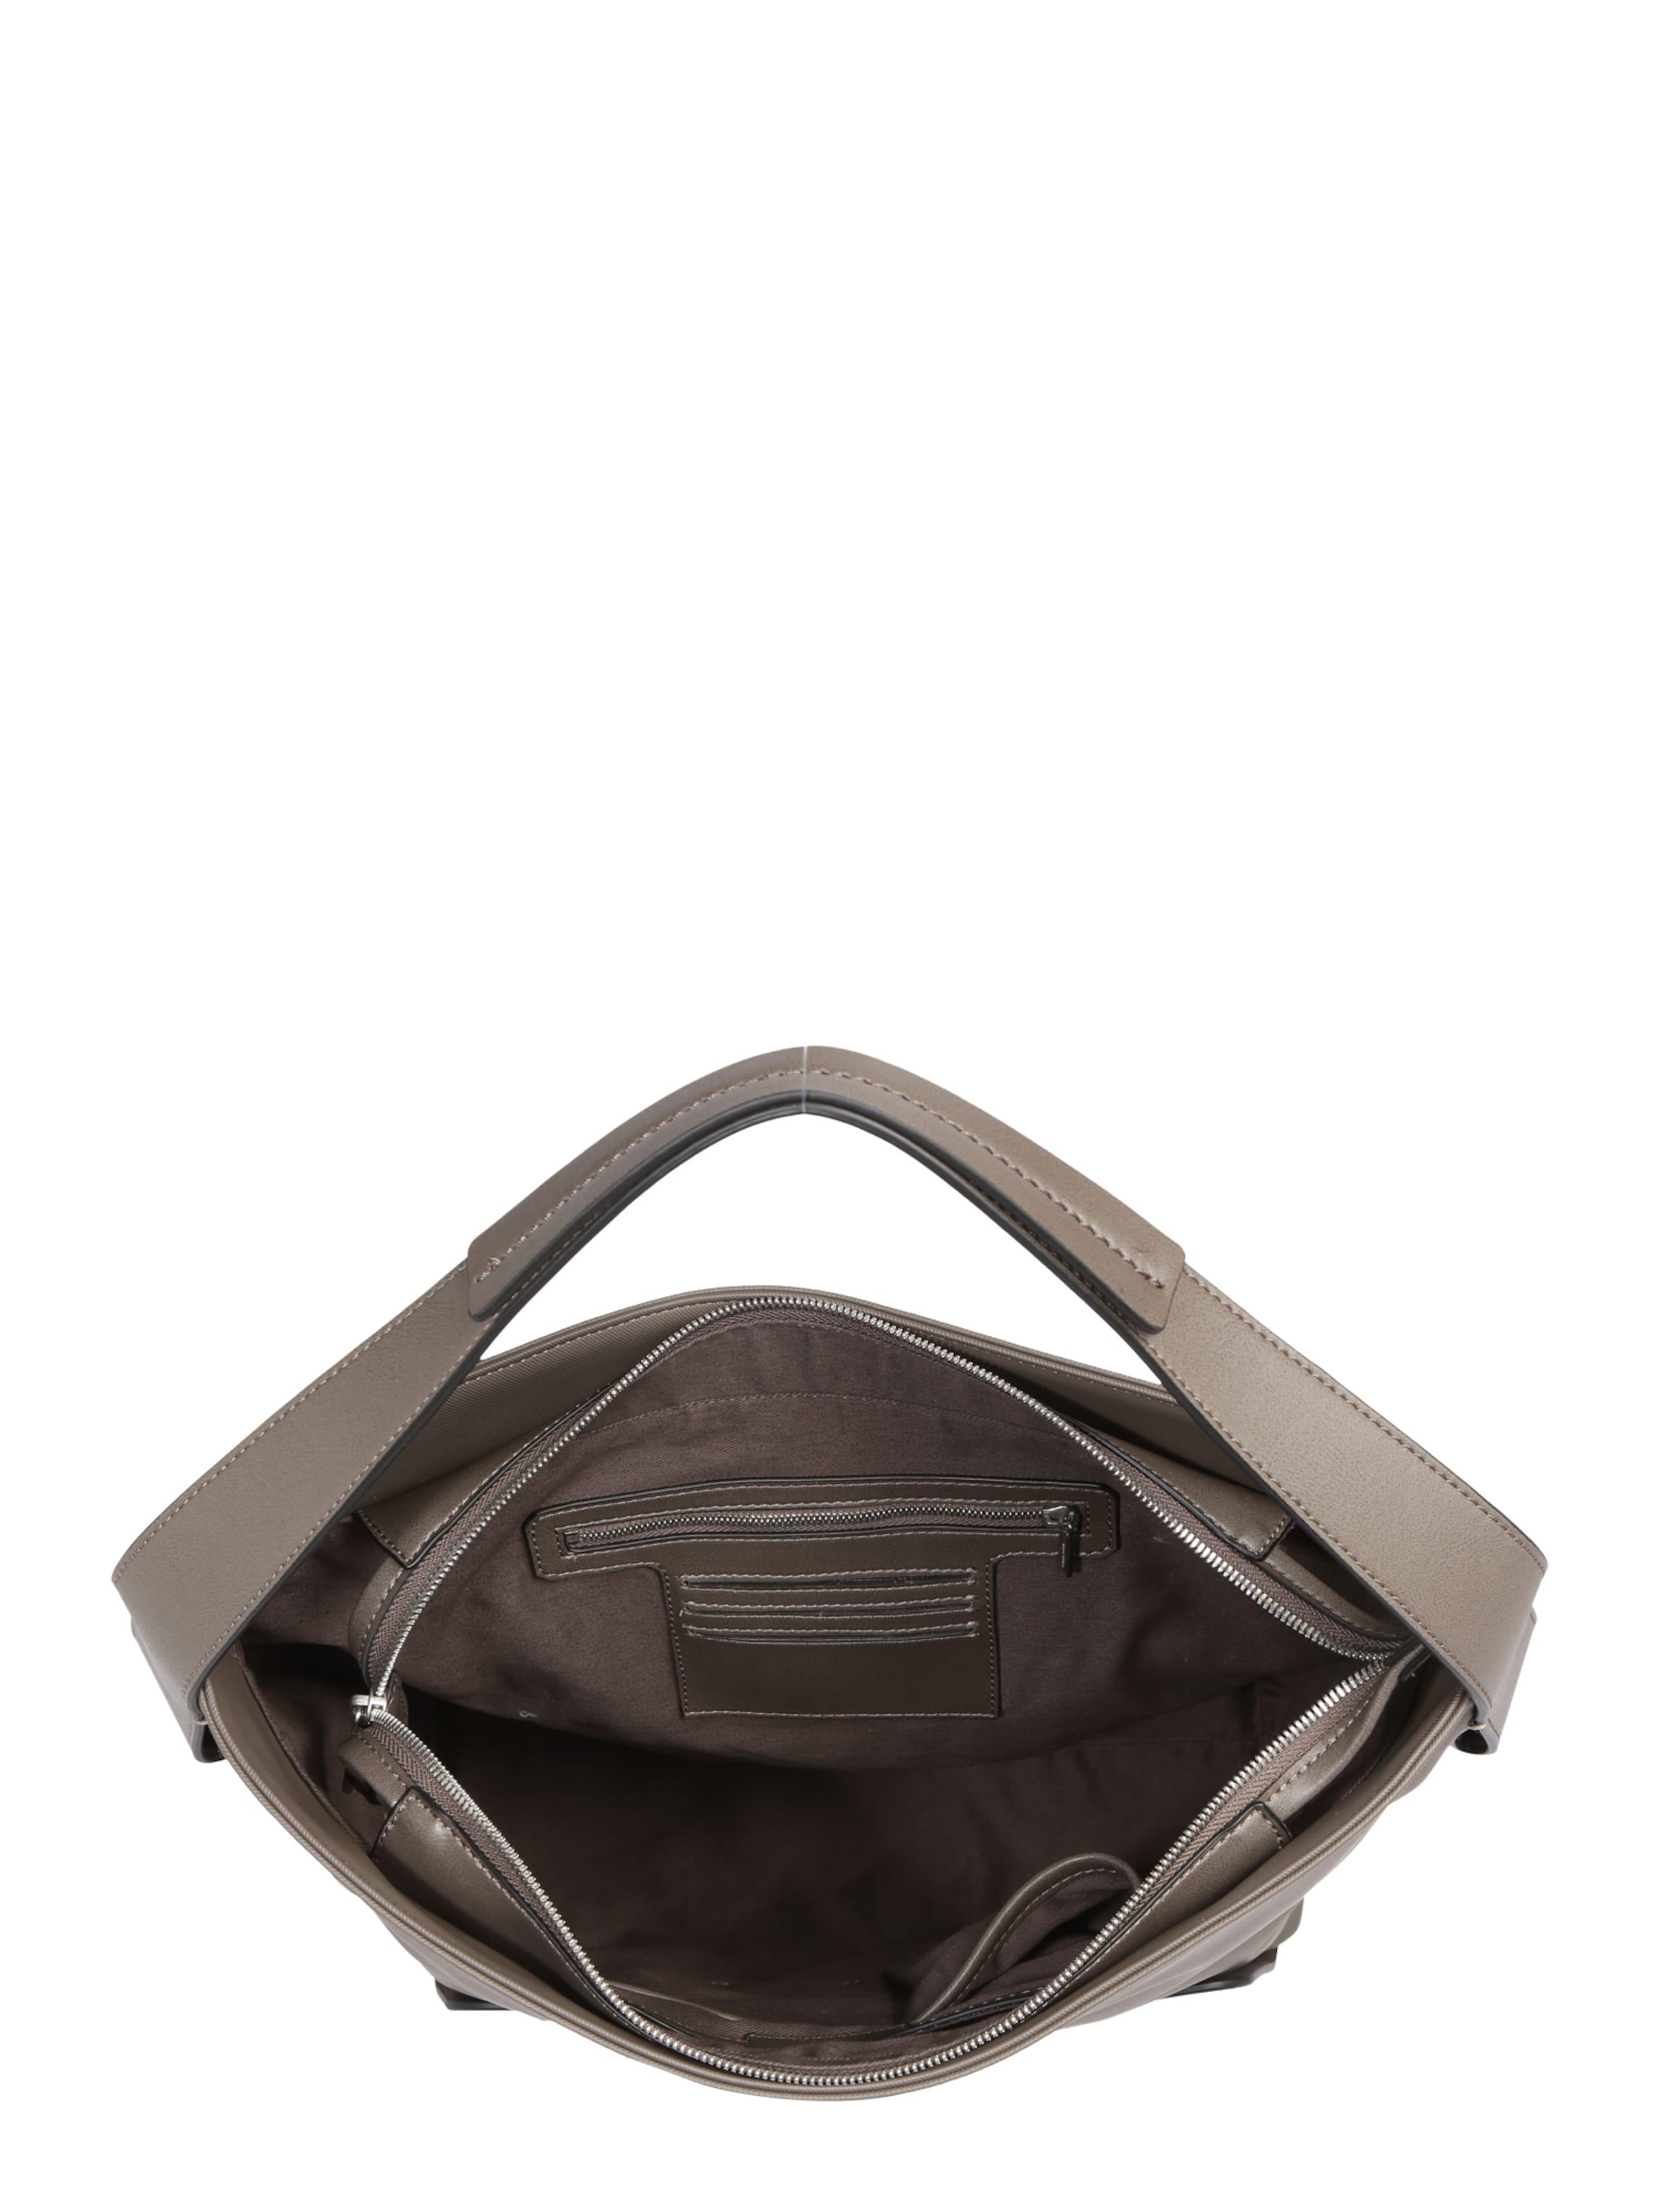 Bilder Günstiger Preis Verkauf Blick Marc O'Polo Hobo-Bag 'Eightyseven' Billig Rabatt Freies Verschiffen Bester Großhandel ckwF6VecX